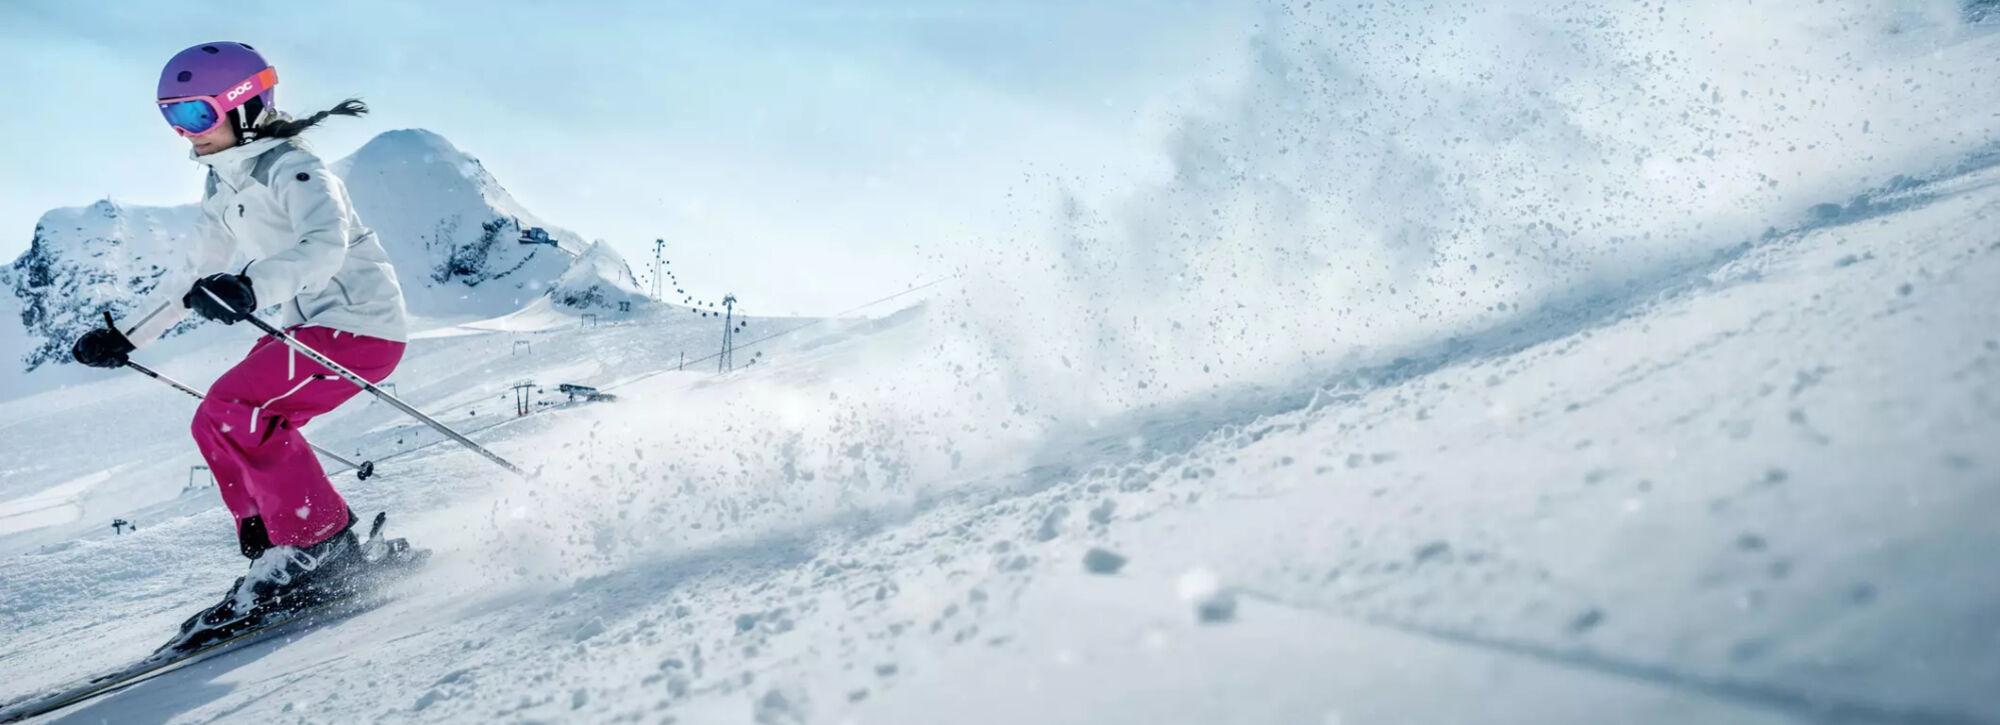 Skifahren am Kitzsteinhorn